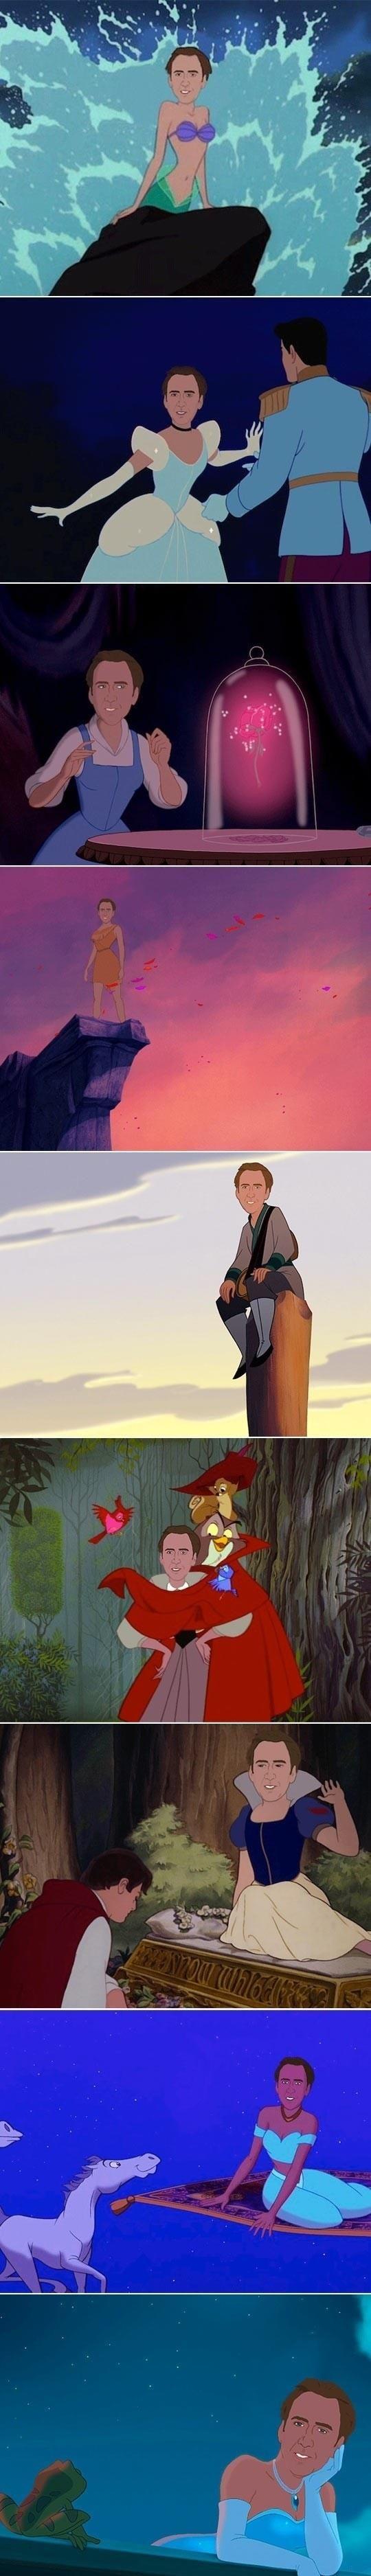 18 best Disney images on Pinterest